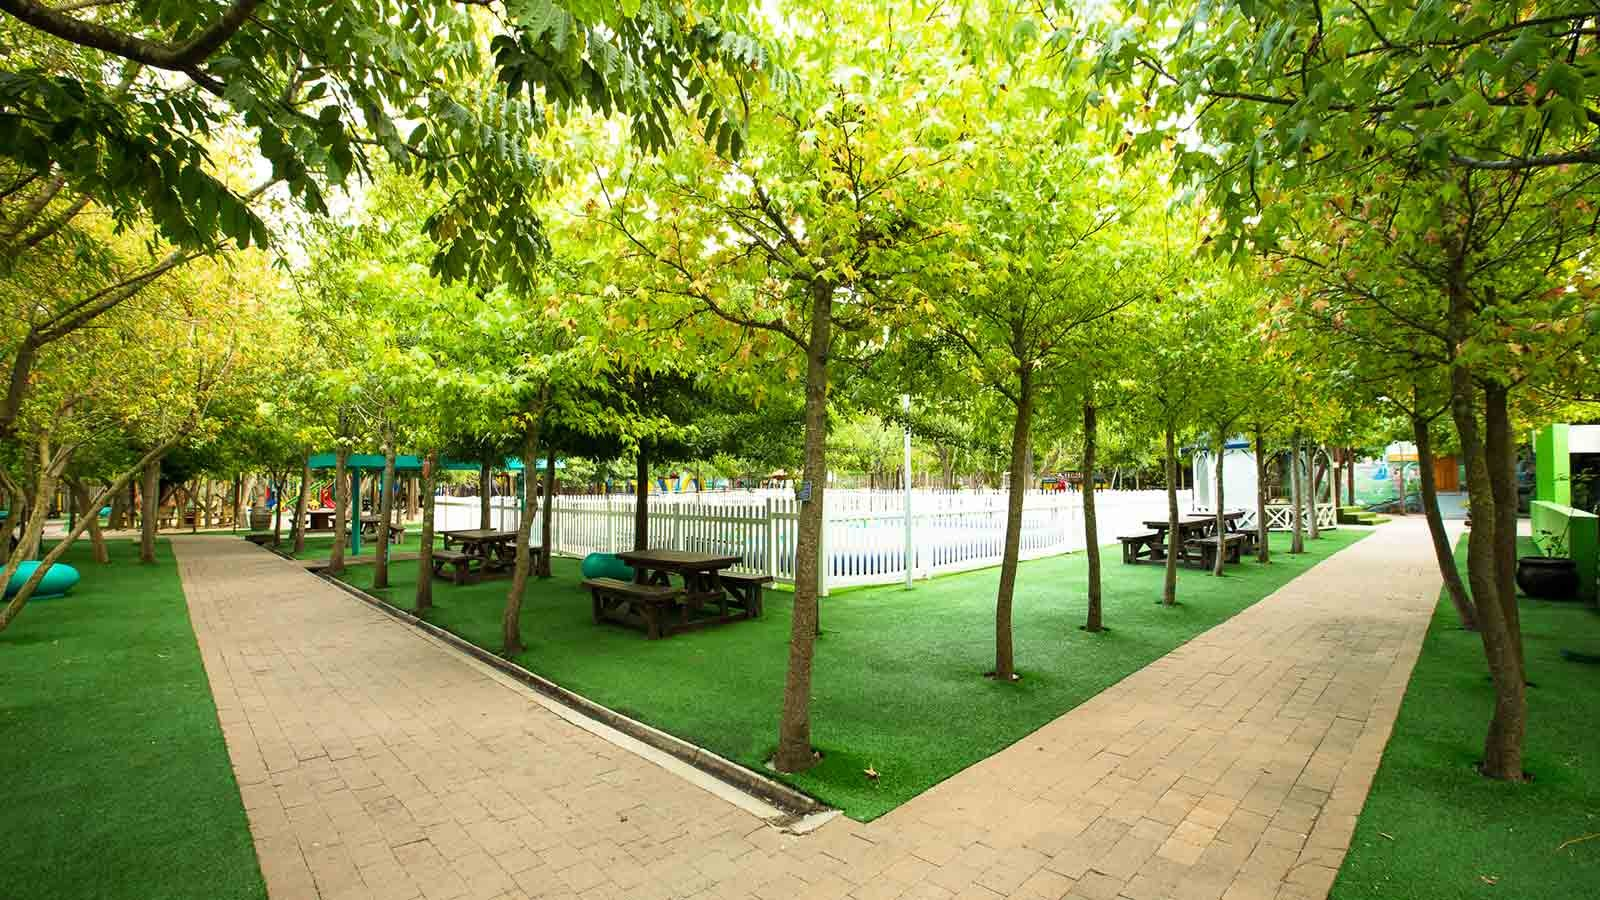 Bugz Playpark | Park & Rides